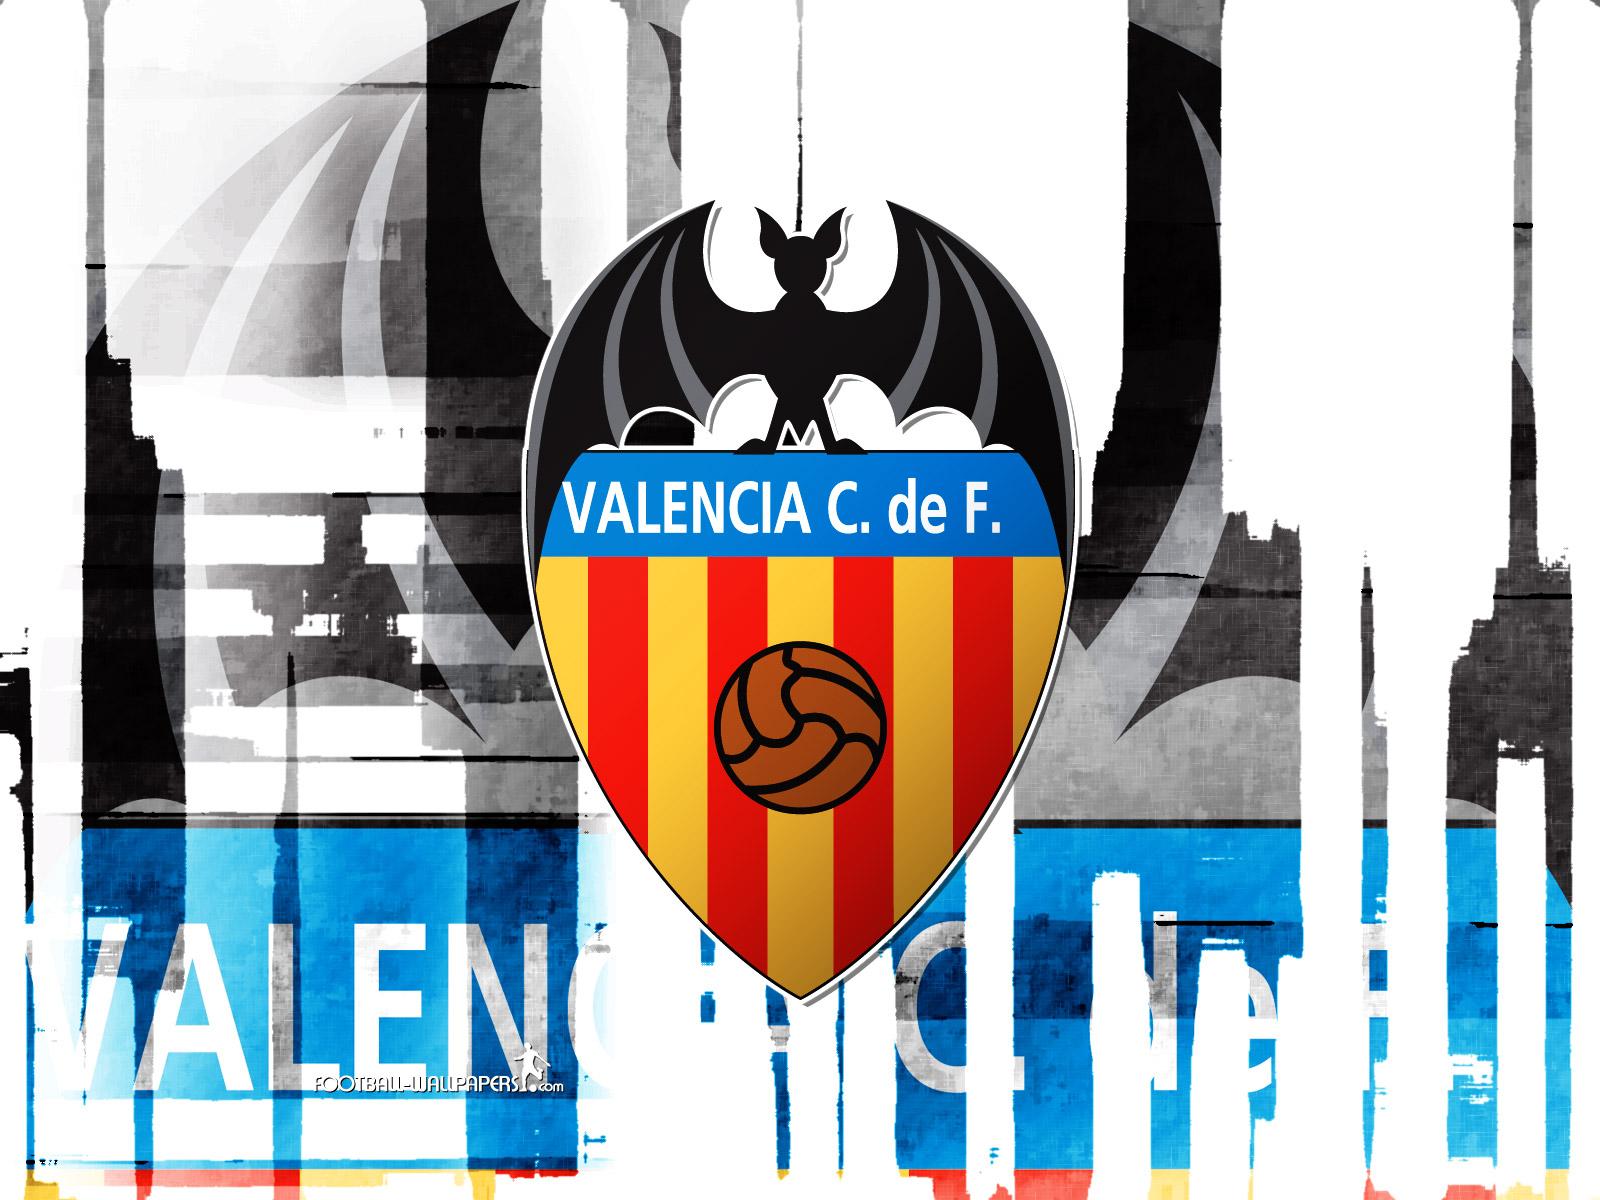 valencia11600x1200.jpg